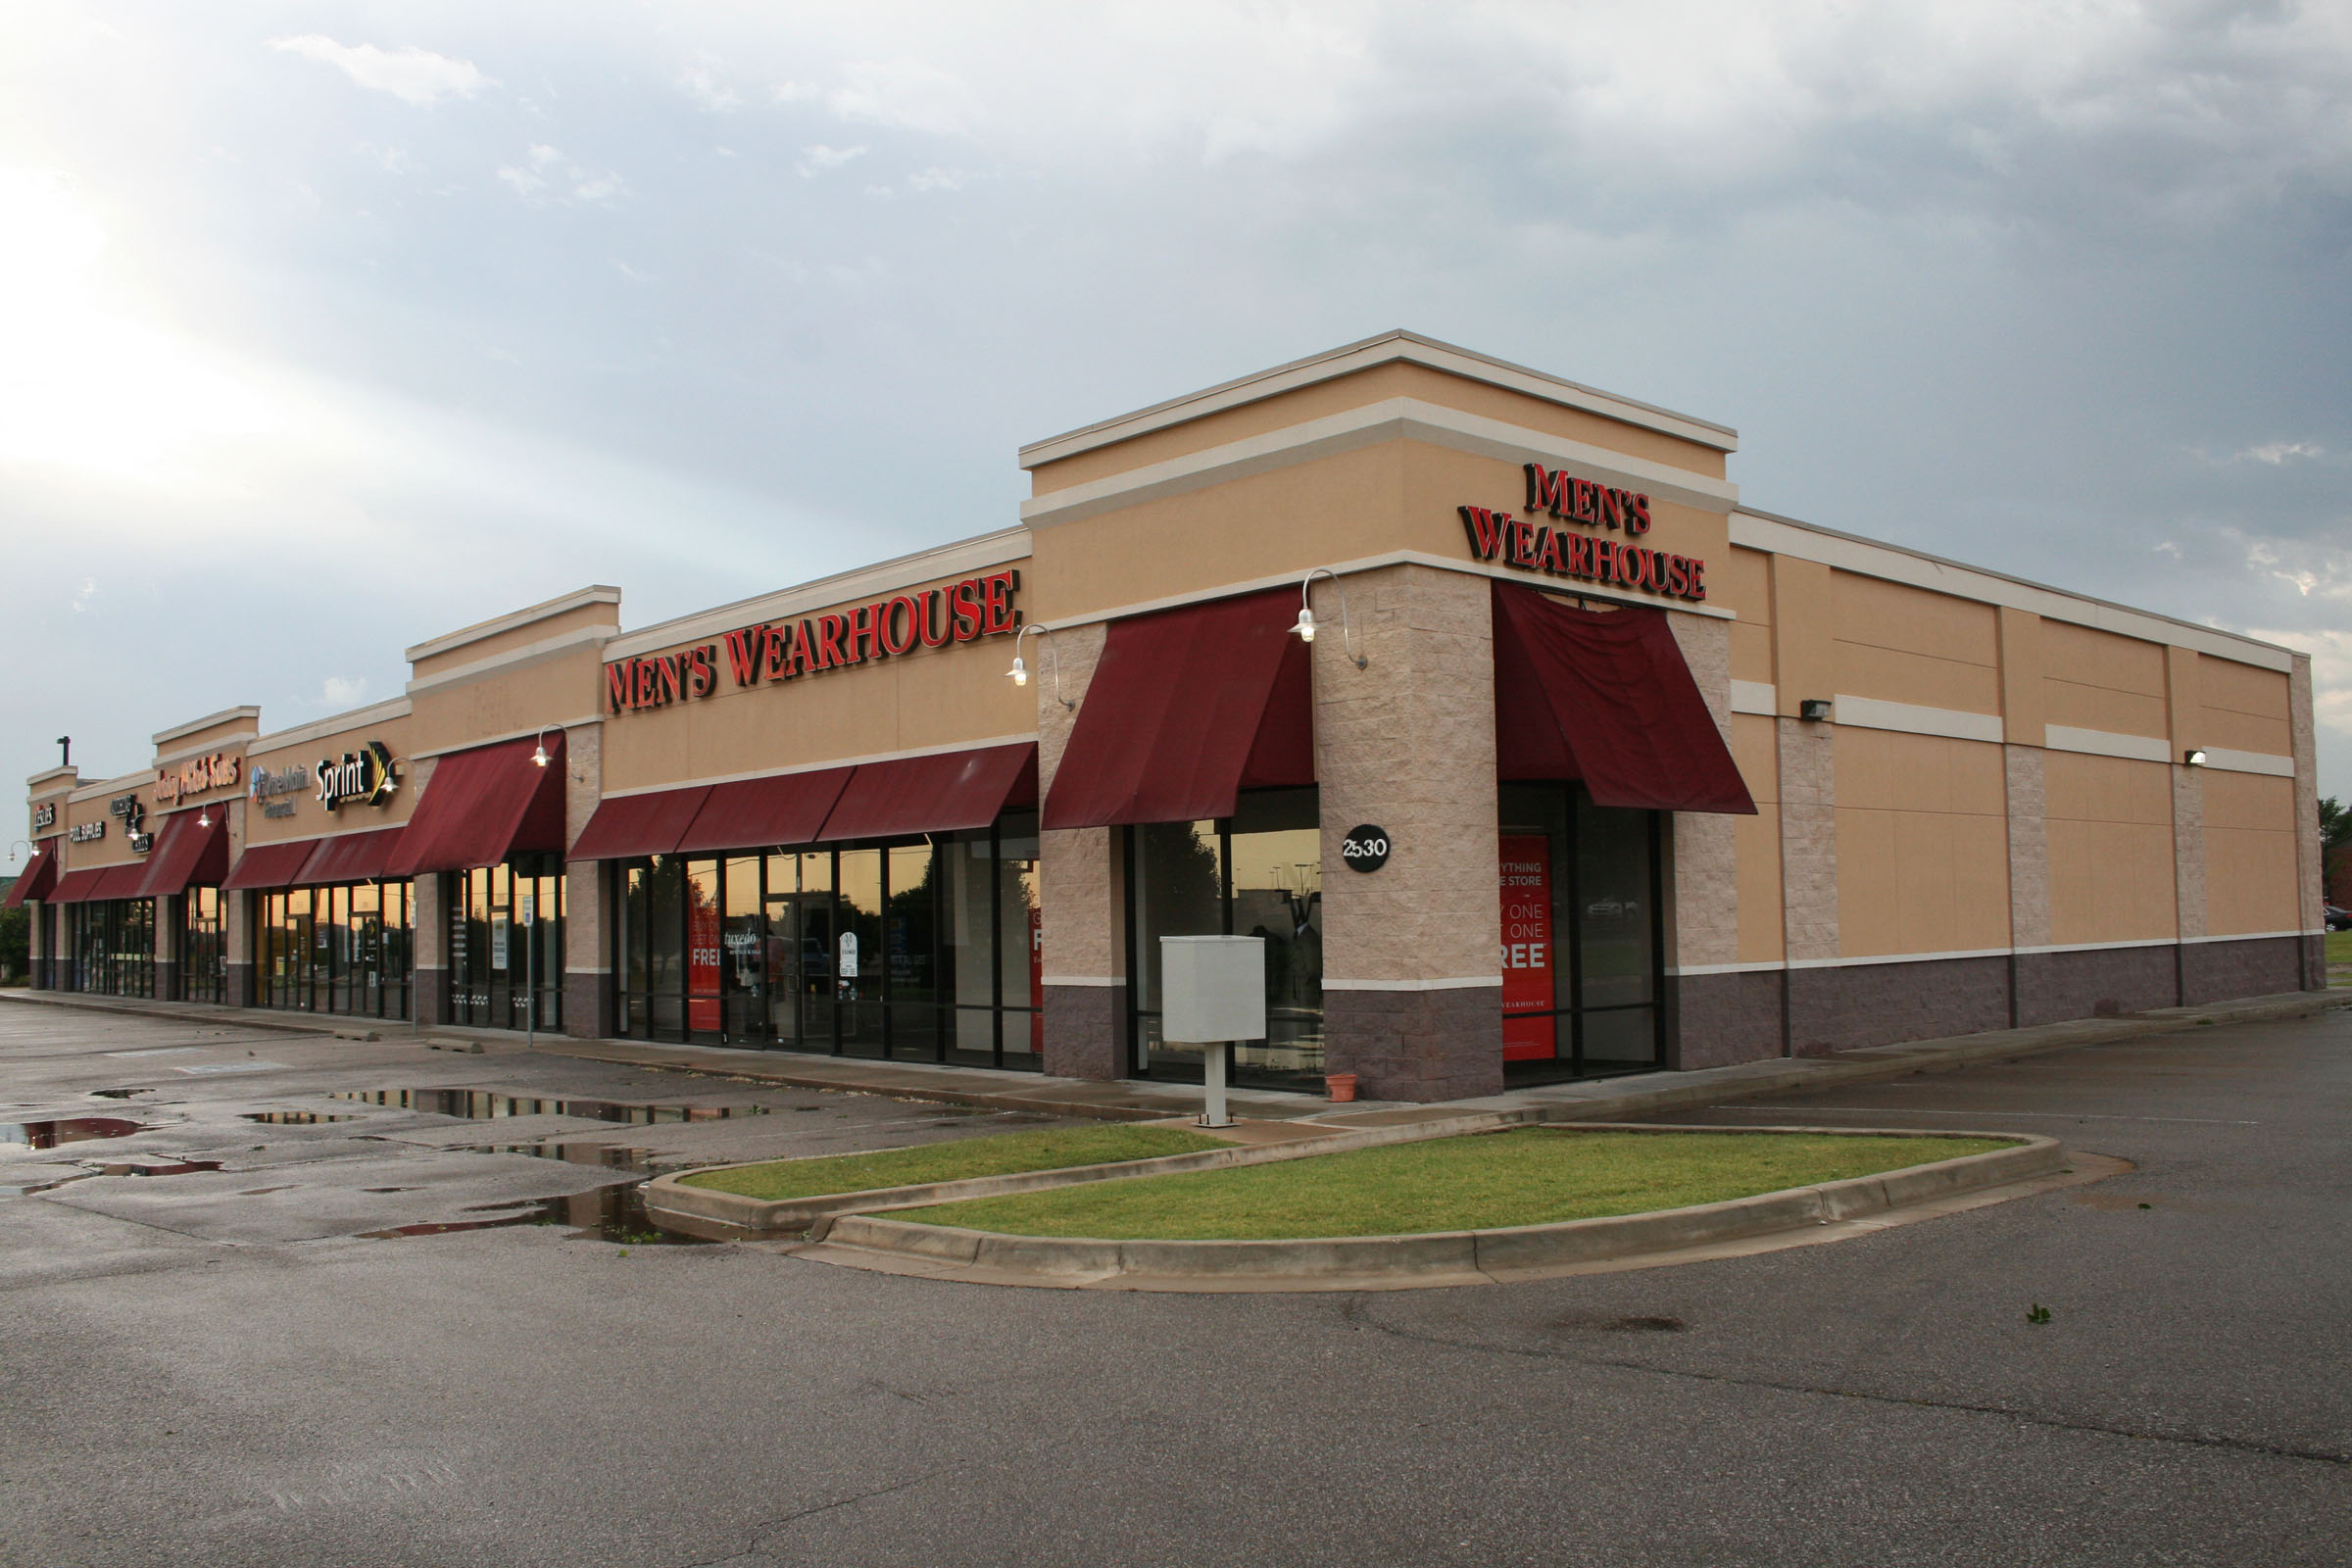 2530 W. Memorial Road, Oklahoma City, OK